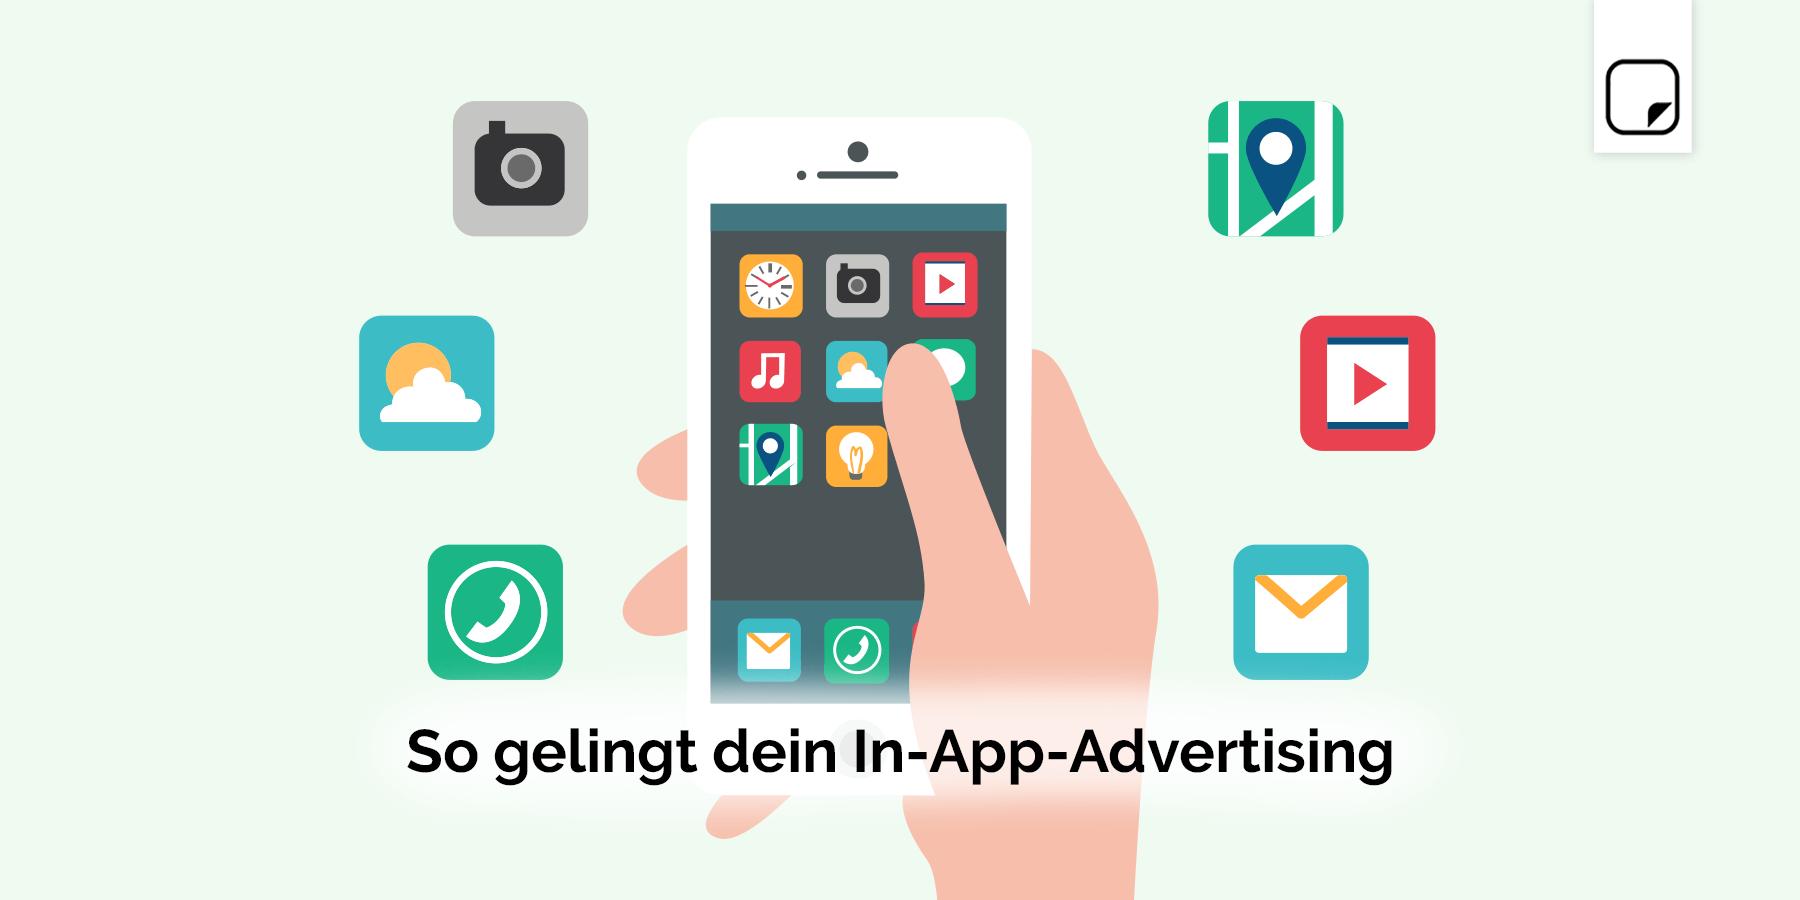 InApp Advertising wleC